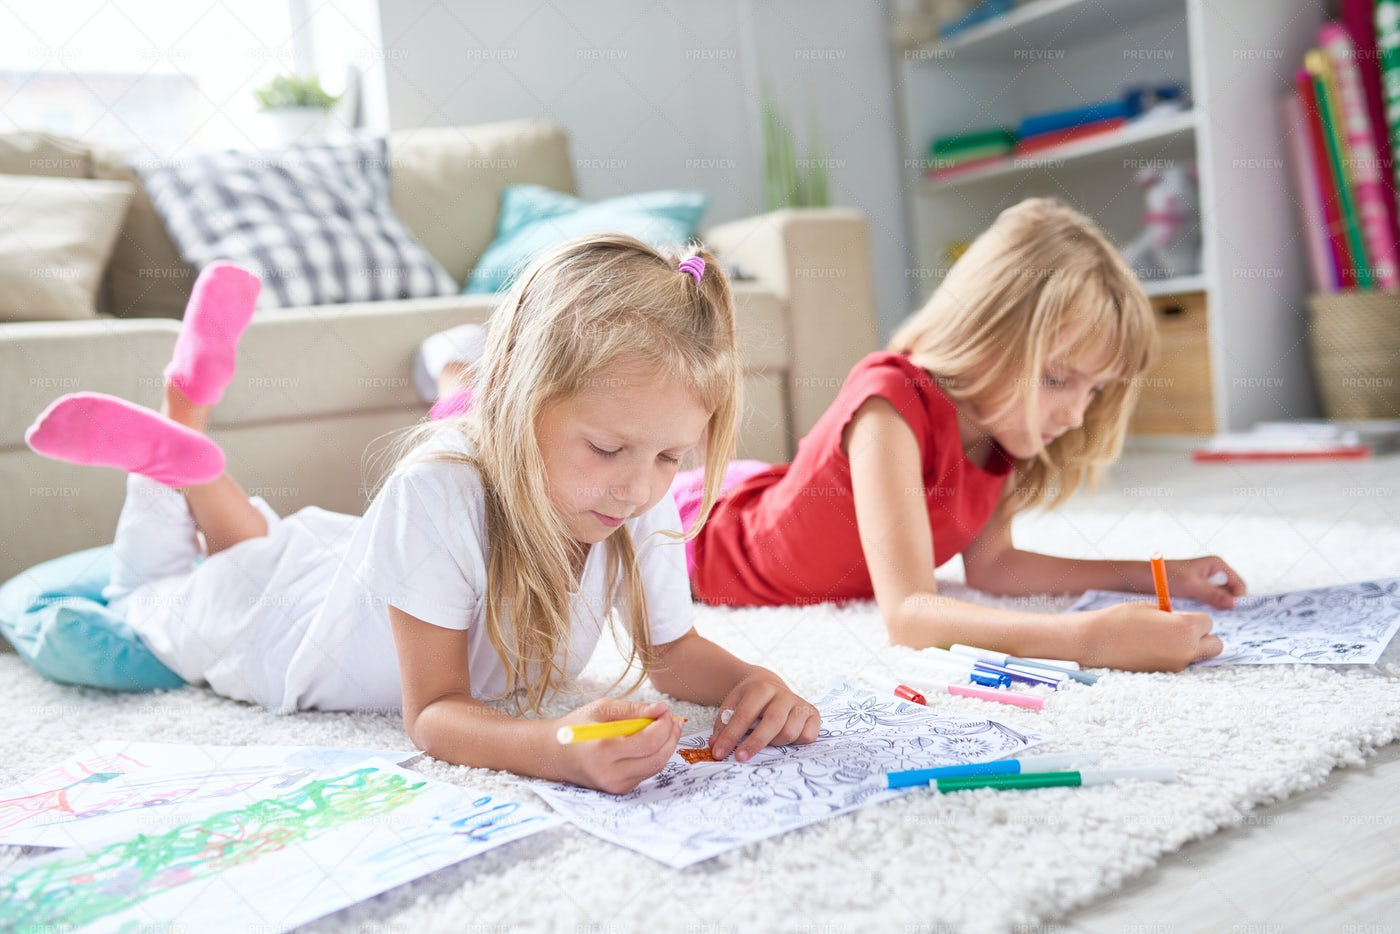 Little Girls Drawing On Floor: Stock Photos